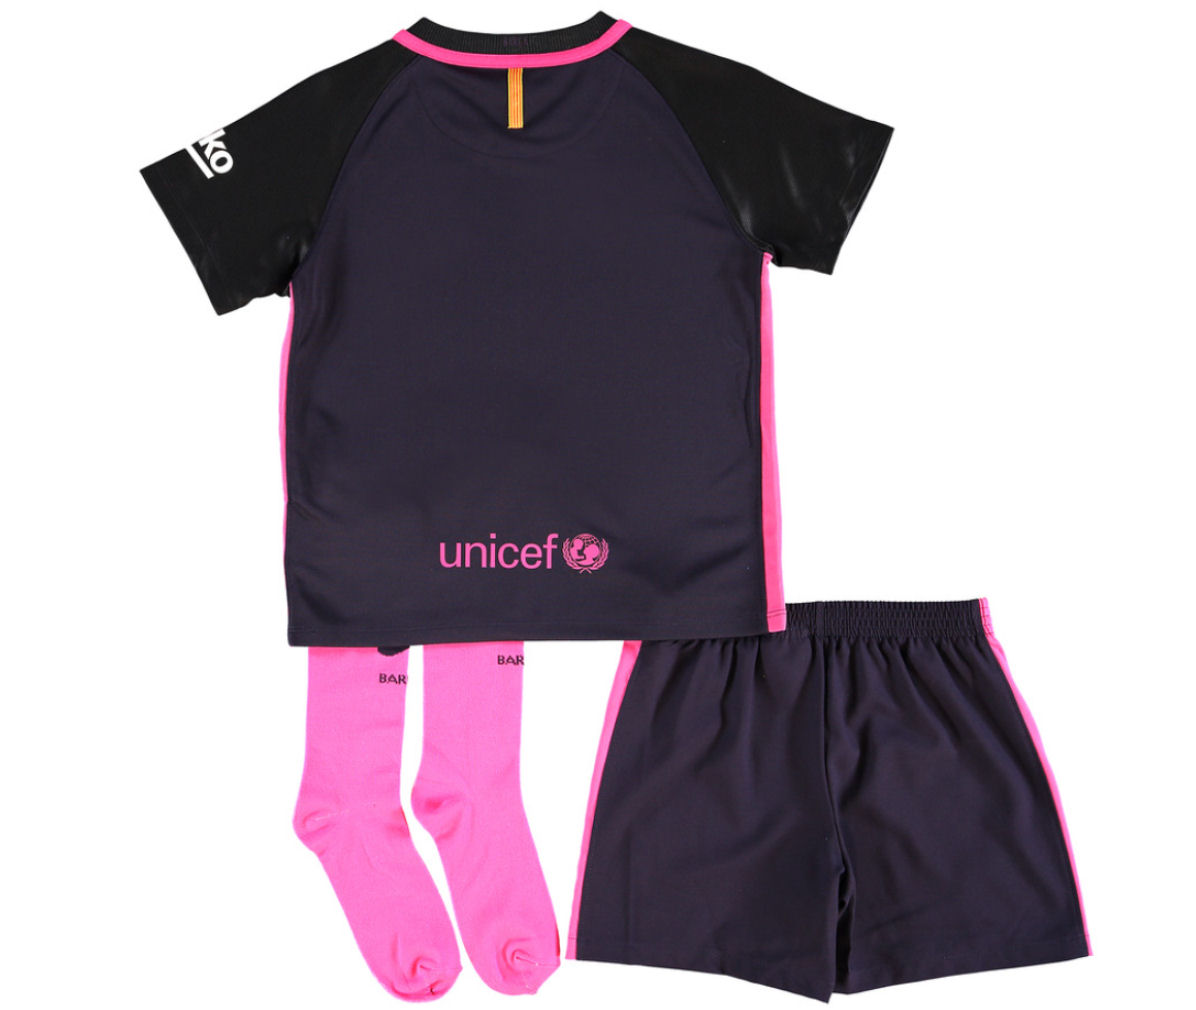 c73bf6b83 2016-2017 Barcelona Away Nike Baby Kit  776716-525  - Uksoccershop